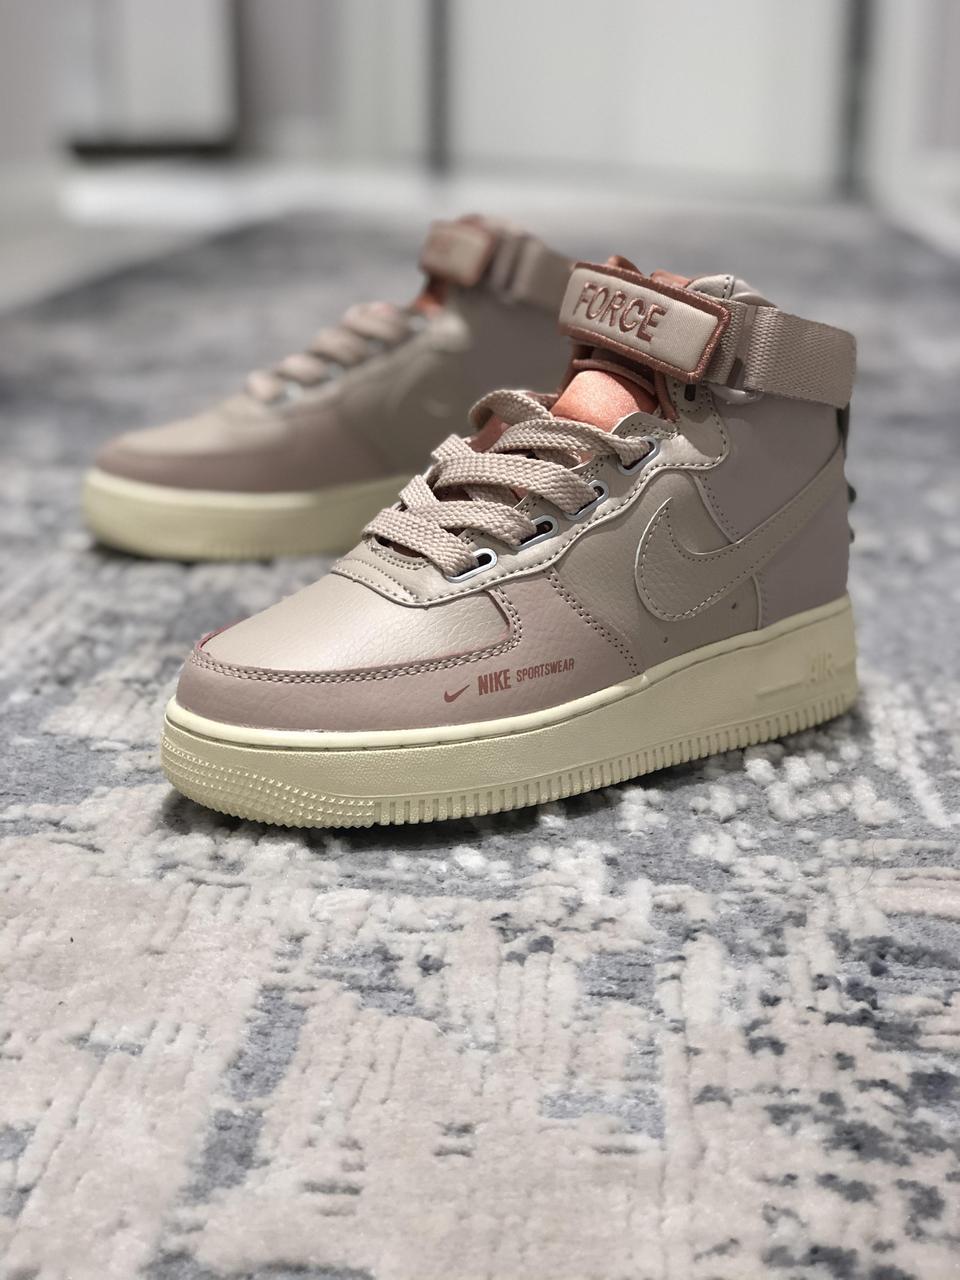 Кроссовки женские в стиле Кроссовки женские в стиле Nike Air Force 1 High